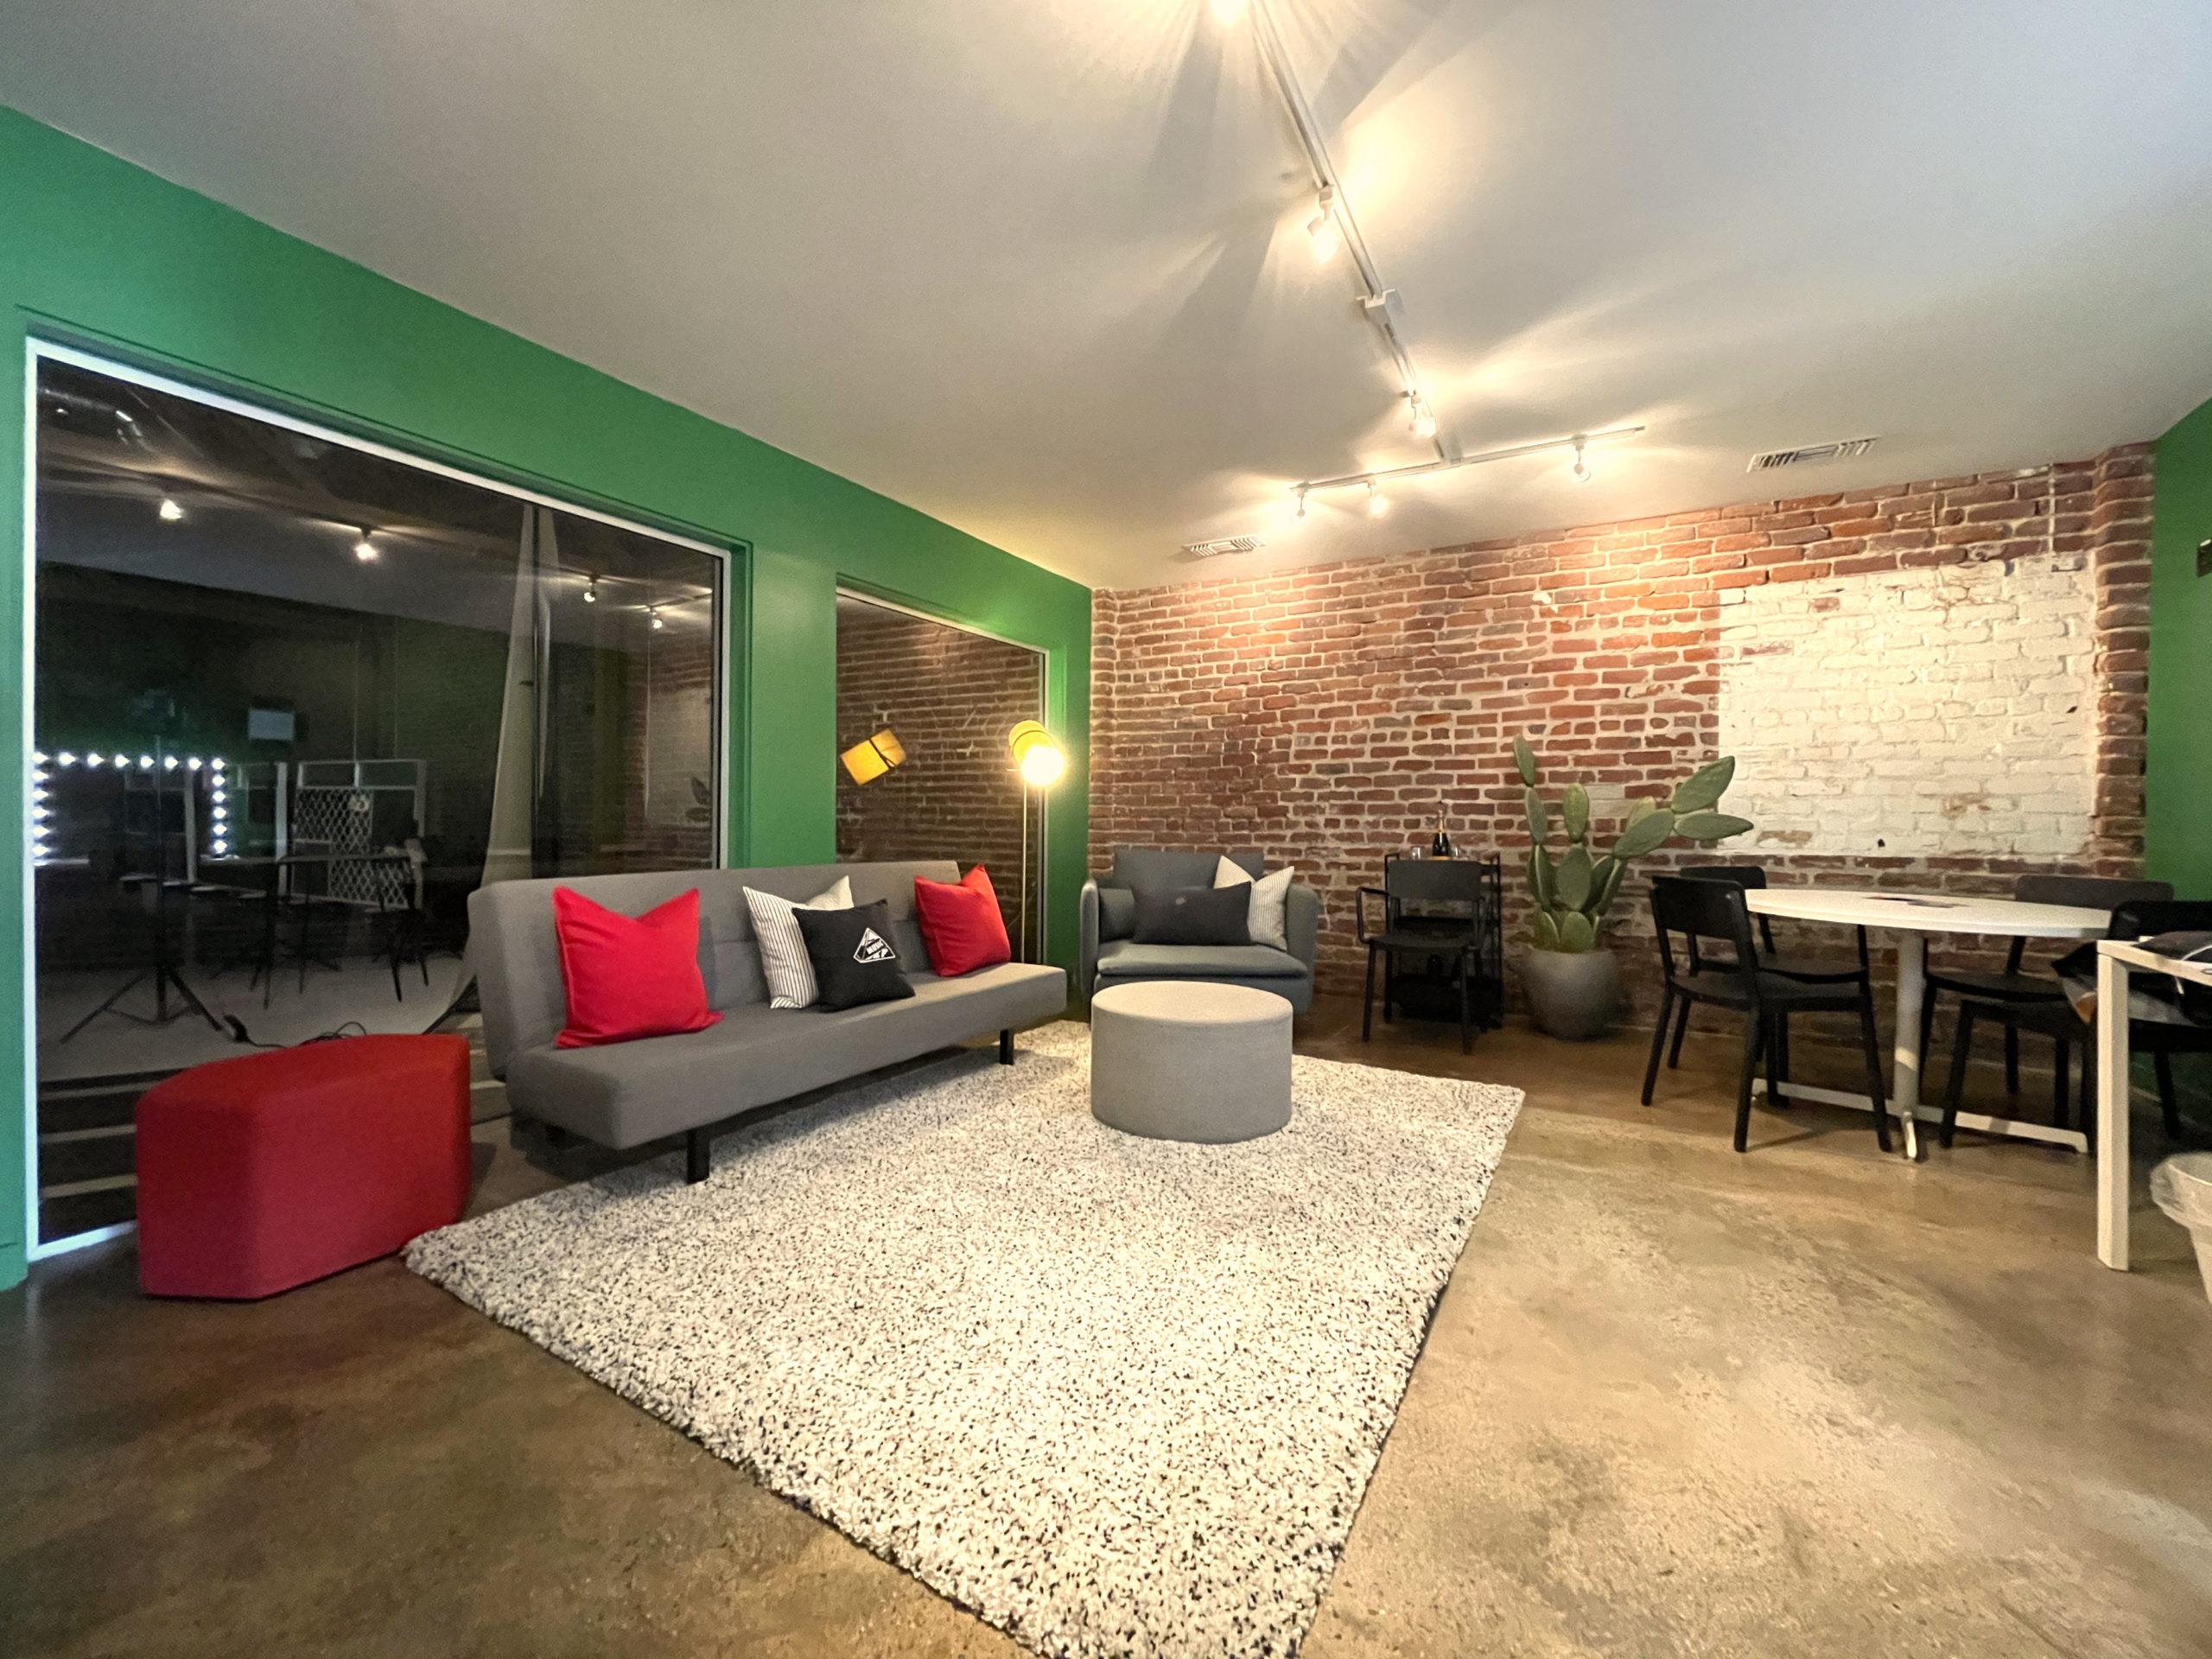 MGS-Green-Room-Lounge-Makeup-Dressing-Room